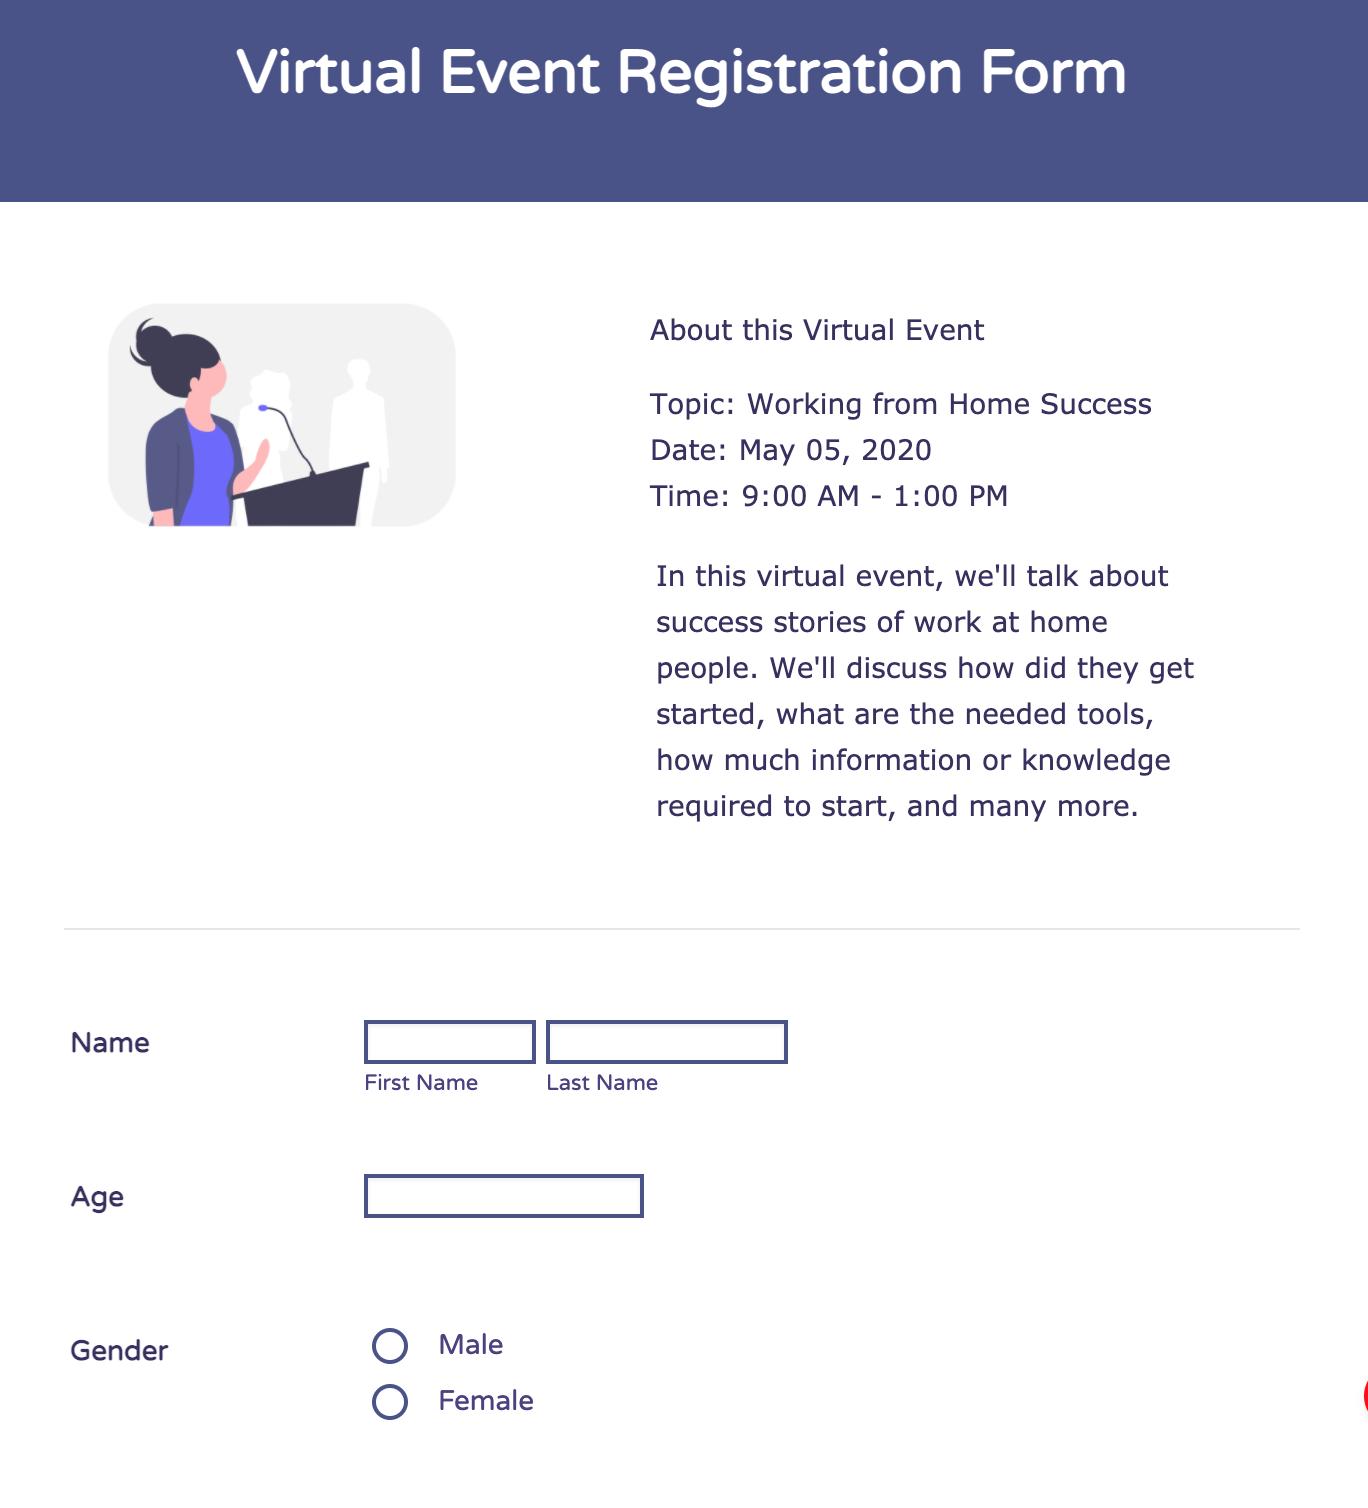 Virtual Event Registration Form Template